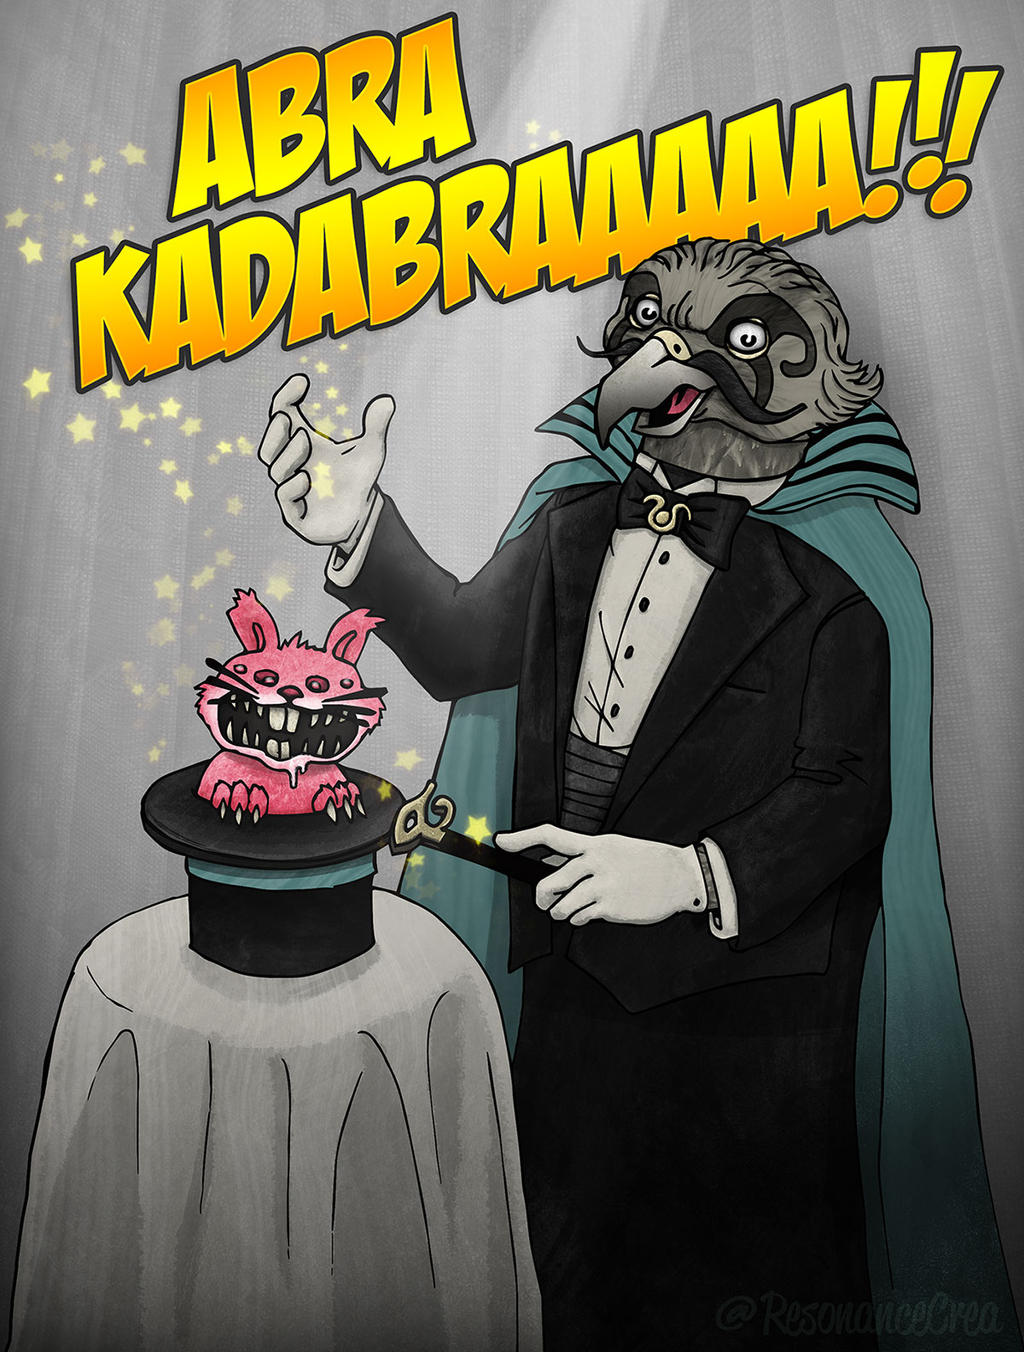 Abra KadabRAAAAA !!! by Resonance-crea